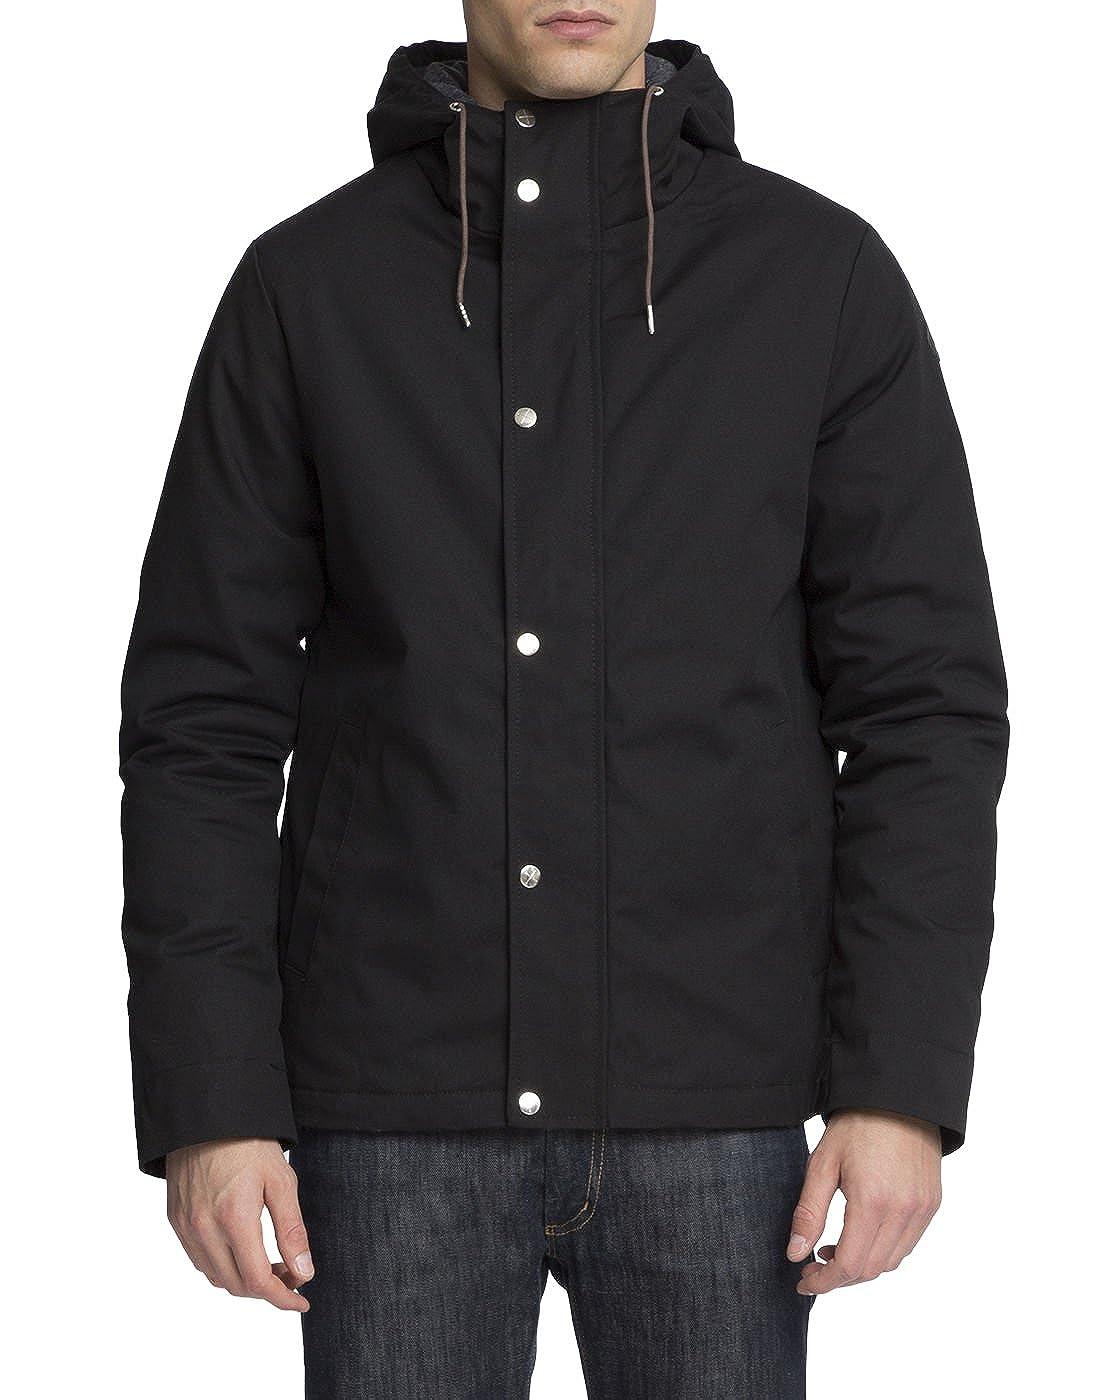 Revolution (RVLT) Jacket Heavy Chaqueta para Hombre